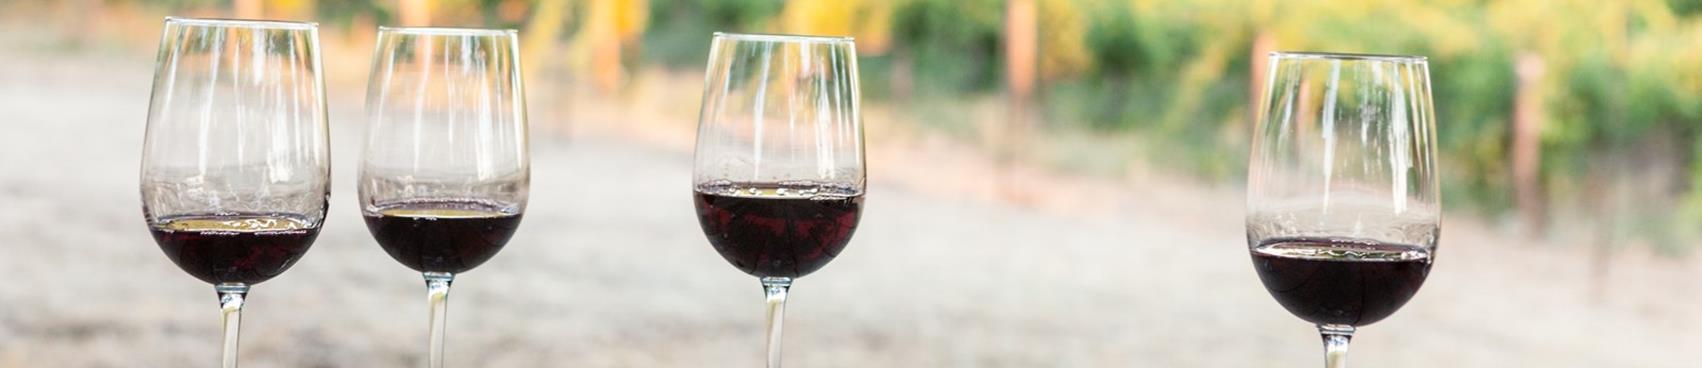 Purchase Tickets to Winemaker Vineyard Tour & Barrel Tasting at Shadow Ranch Vineyard on CellarPass